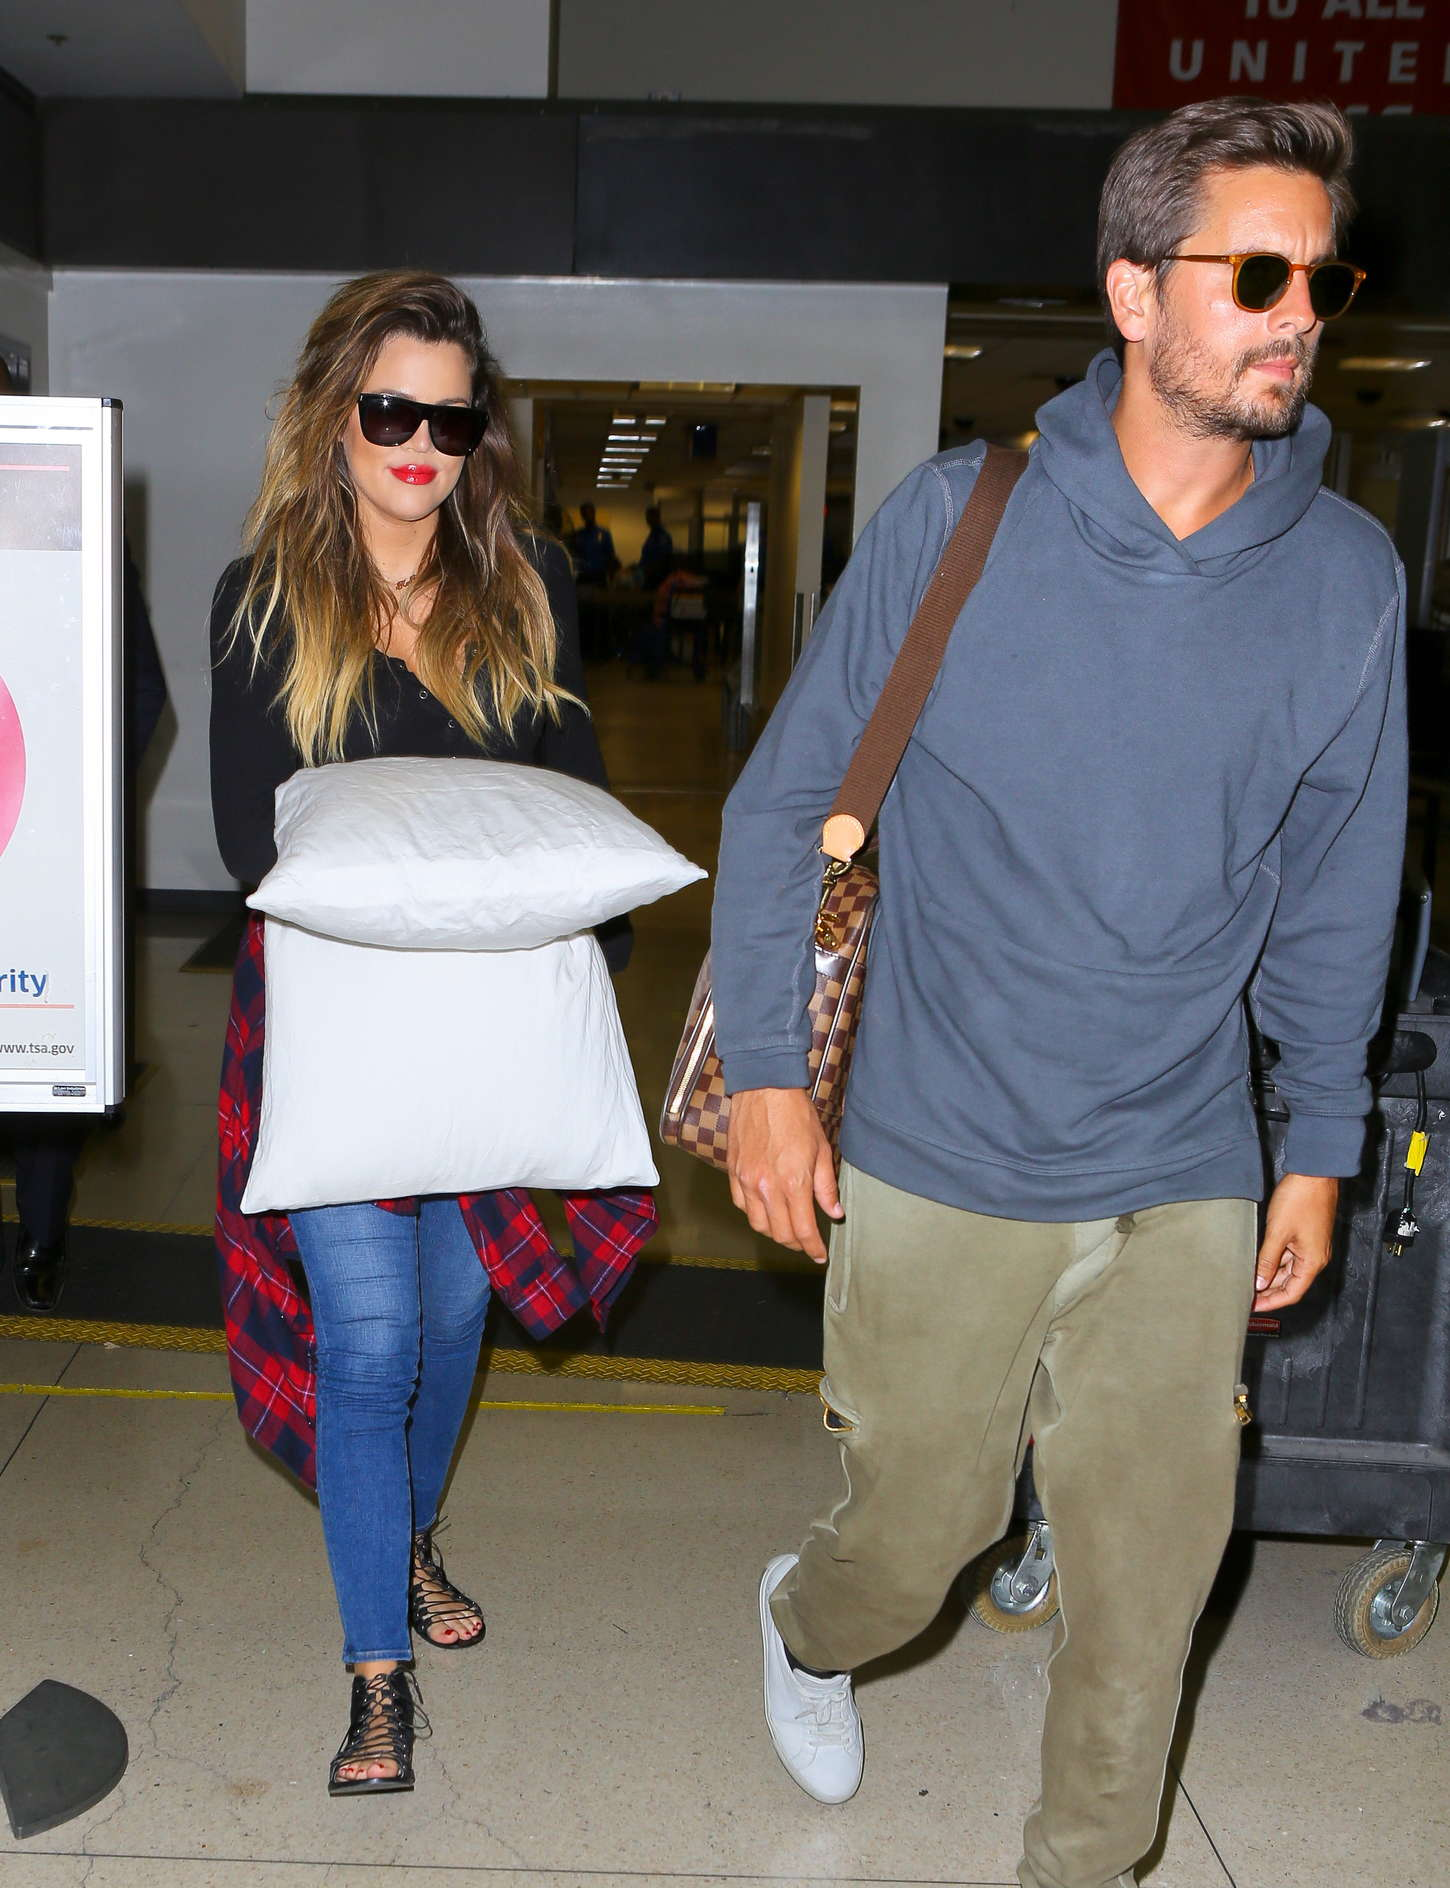 Khloe Kardashian 2014 : Khloe Kardashian with Scott Disick at LAX airport -19